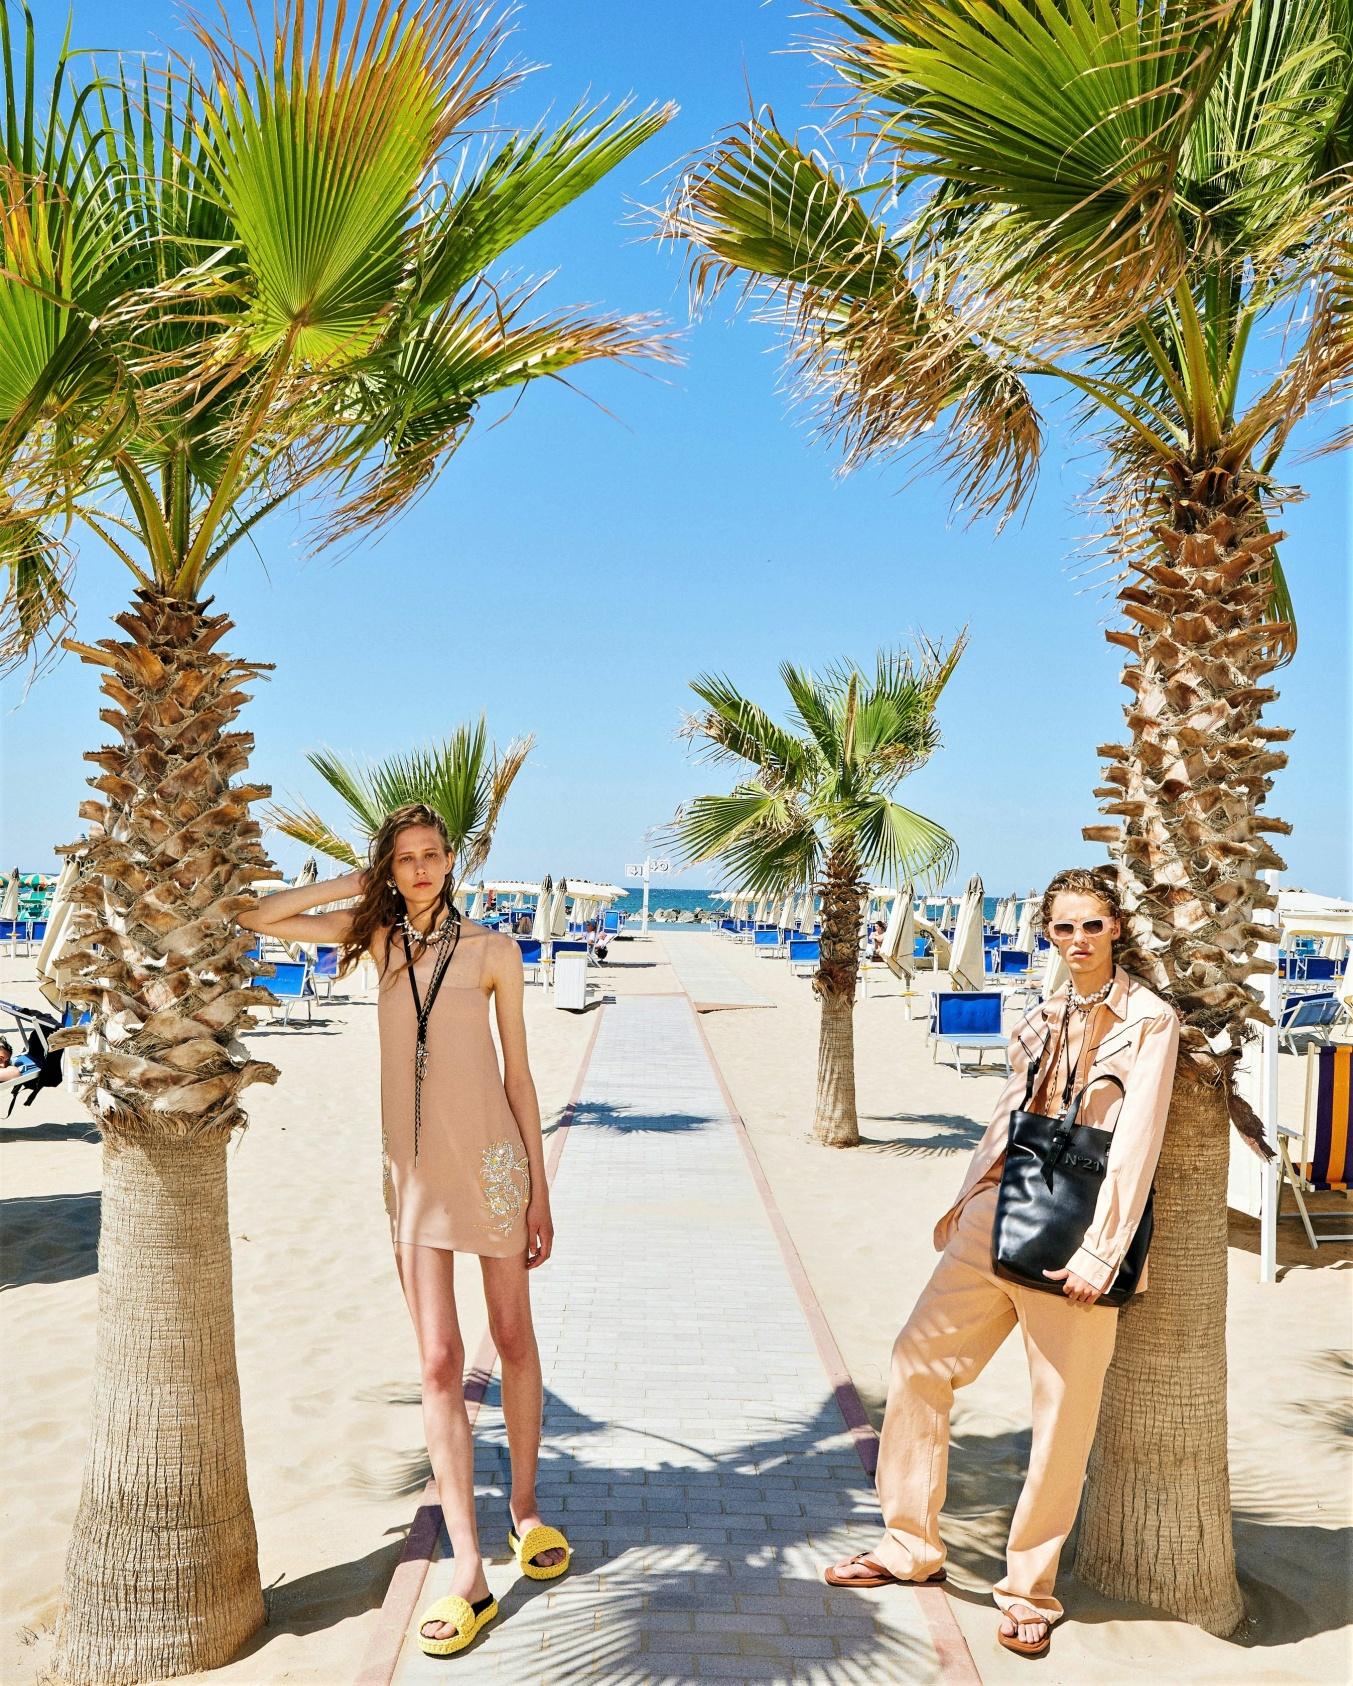 N21 resort 2022 2 models vogue cropped palm trees.jpg